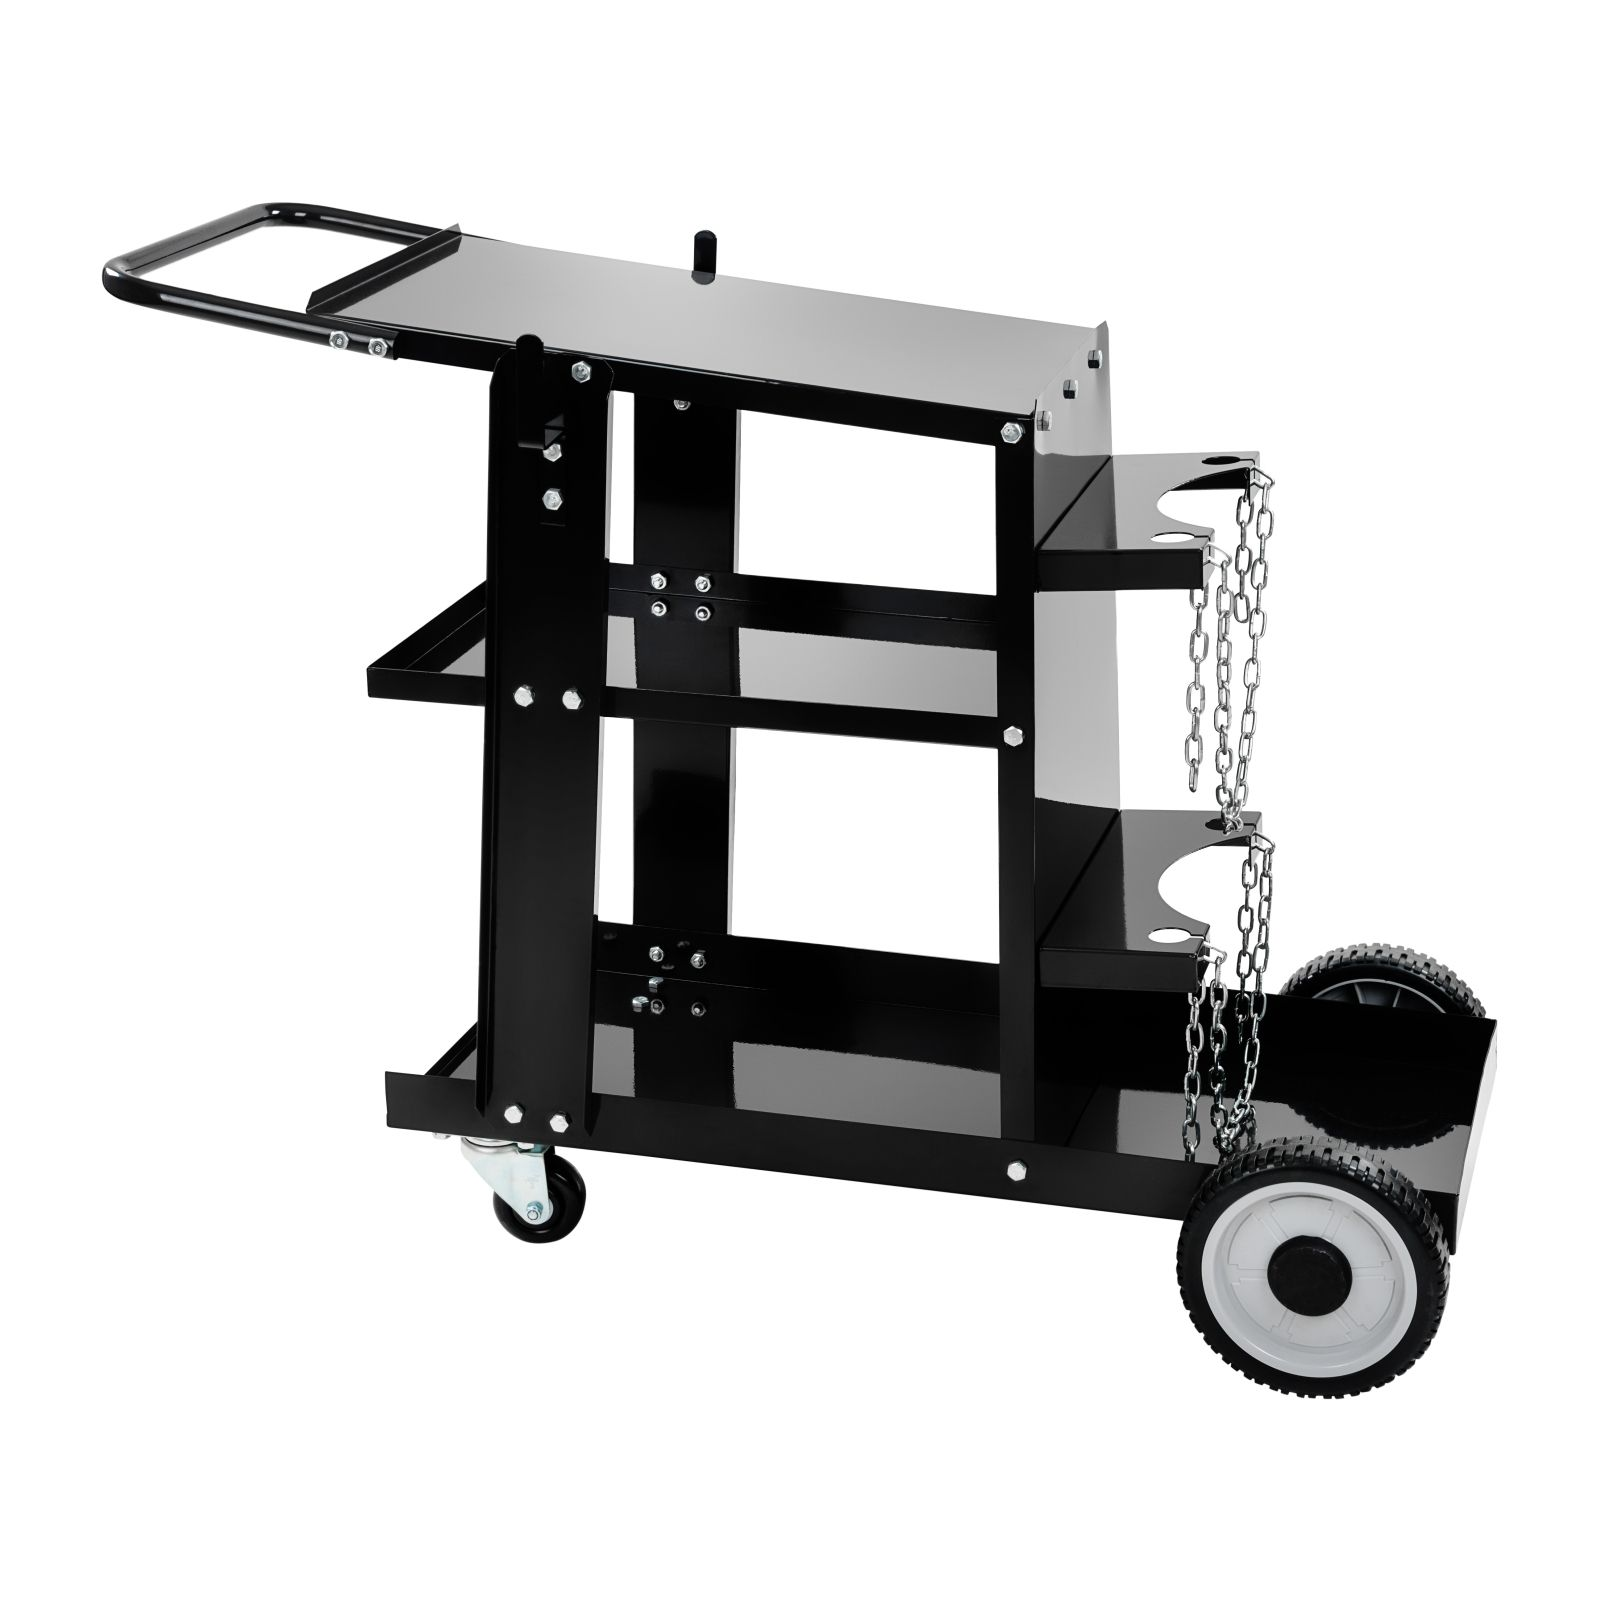 Welding Trolley Universal Mig Mag Plasma Tig Welder Cart